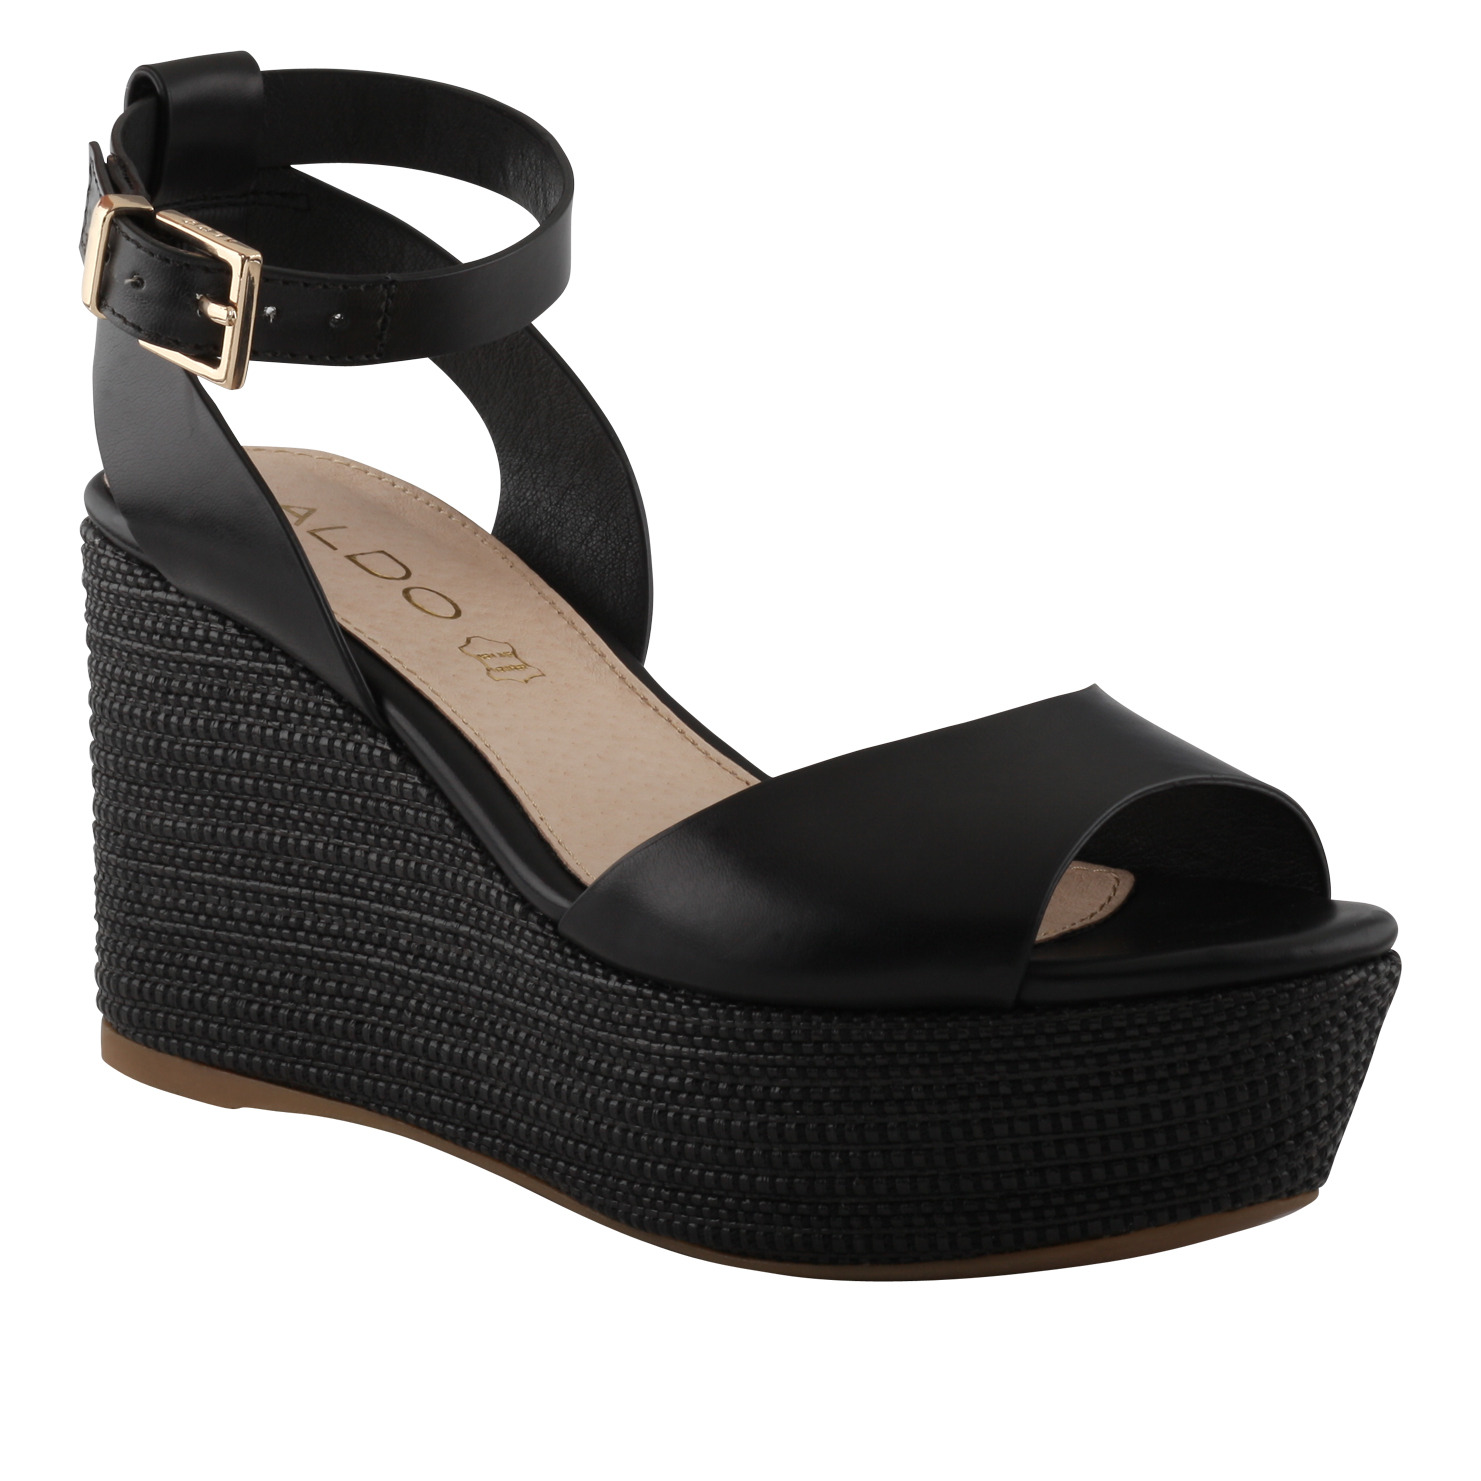 271670d55bc Lyst - ALDO Taipa Wedge Sandals in Black